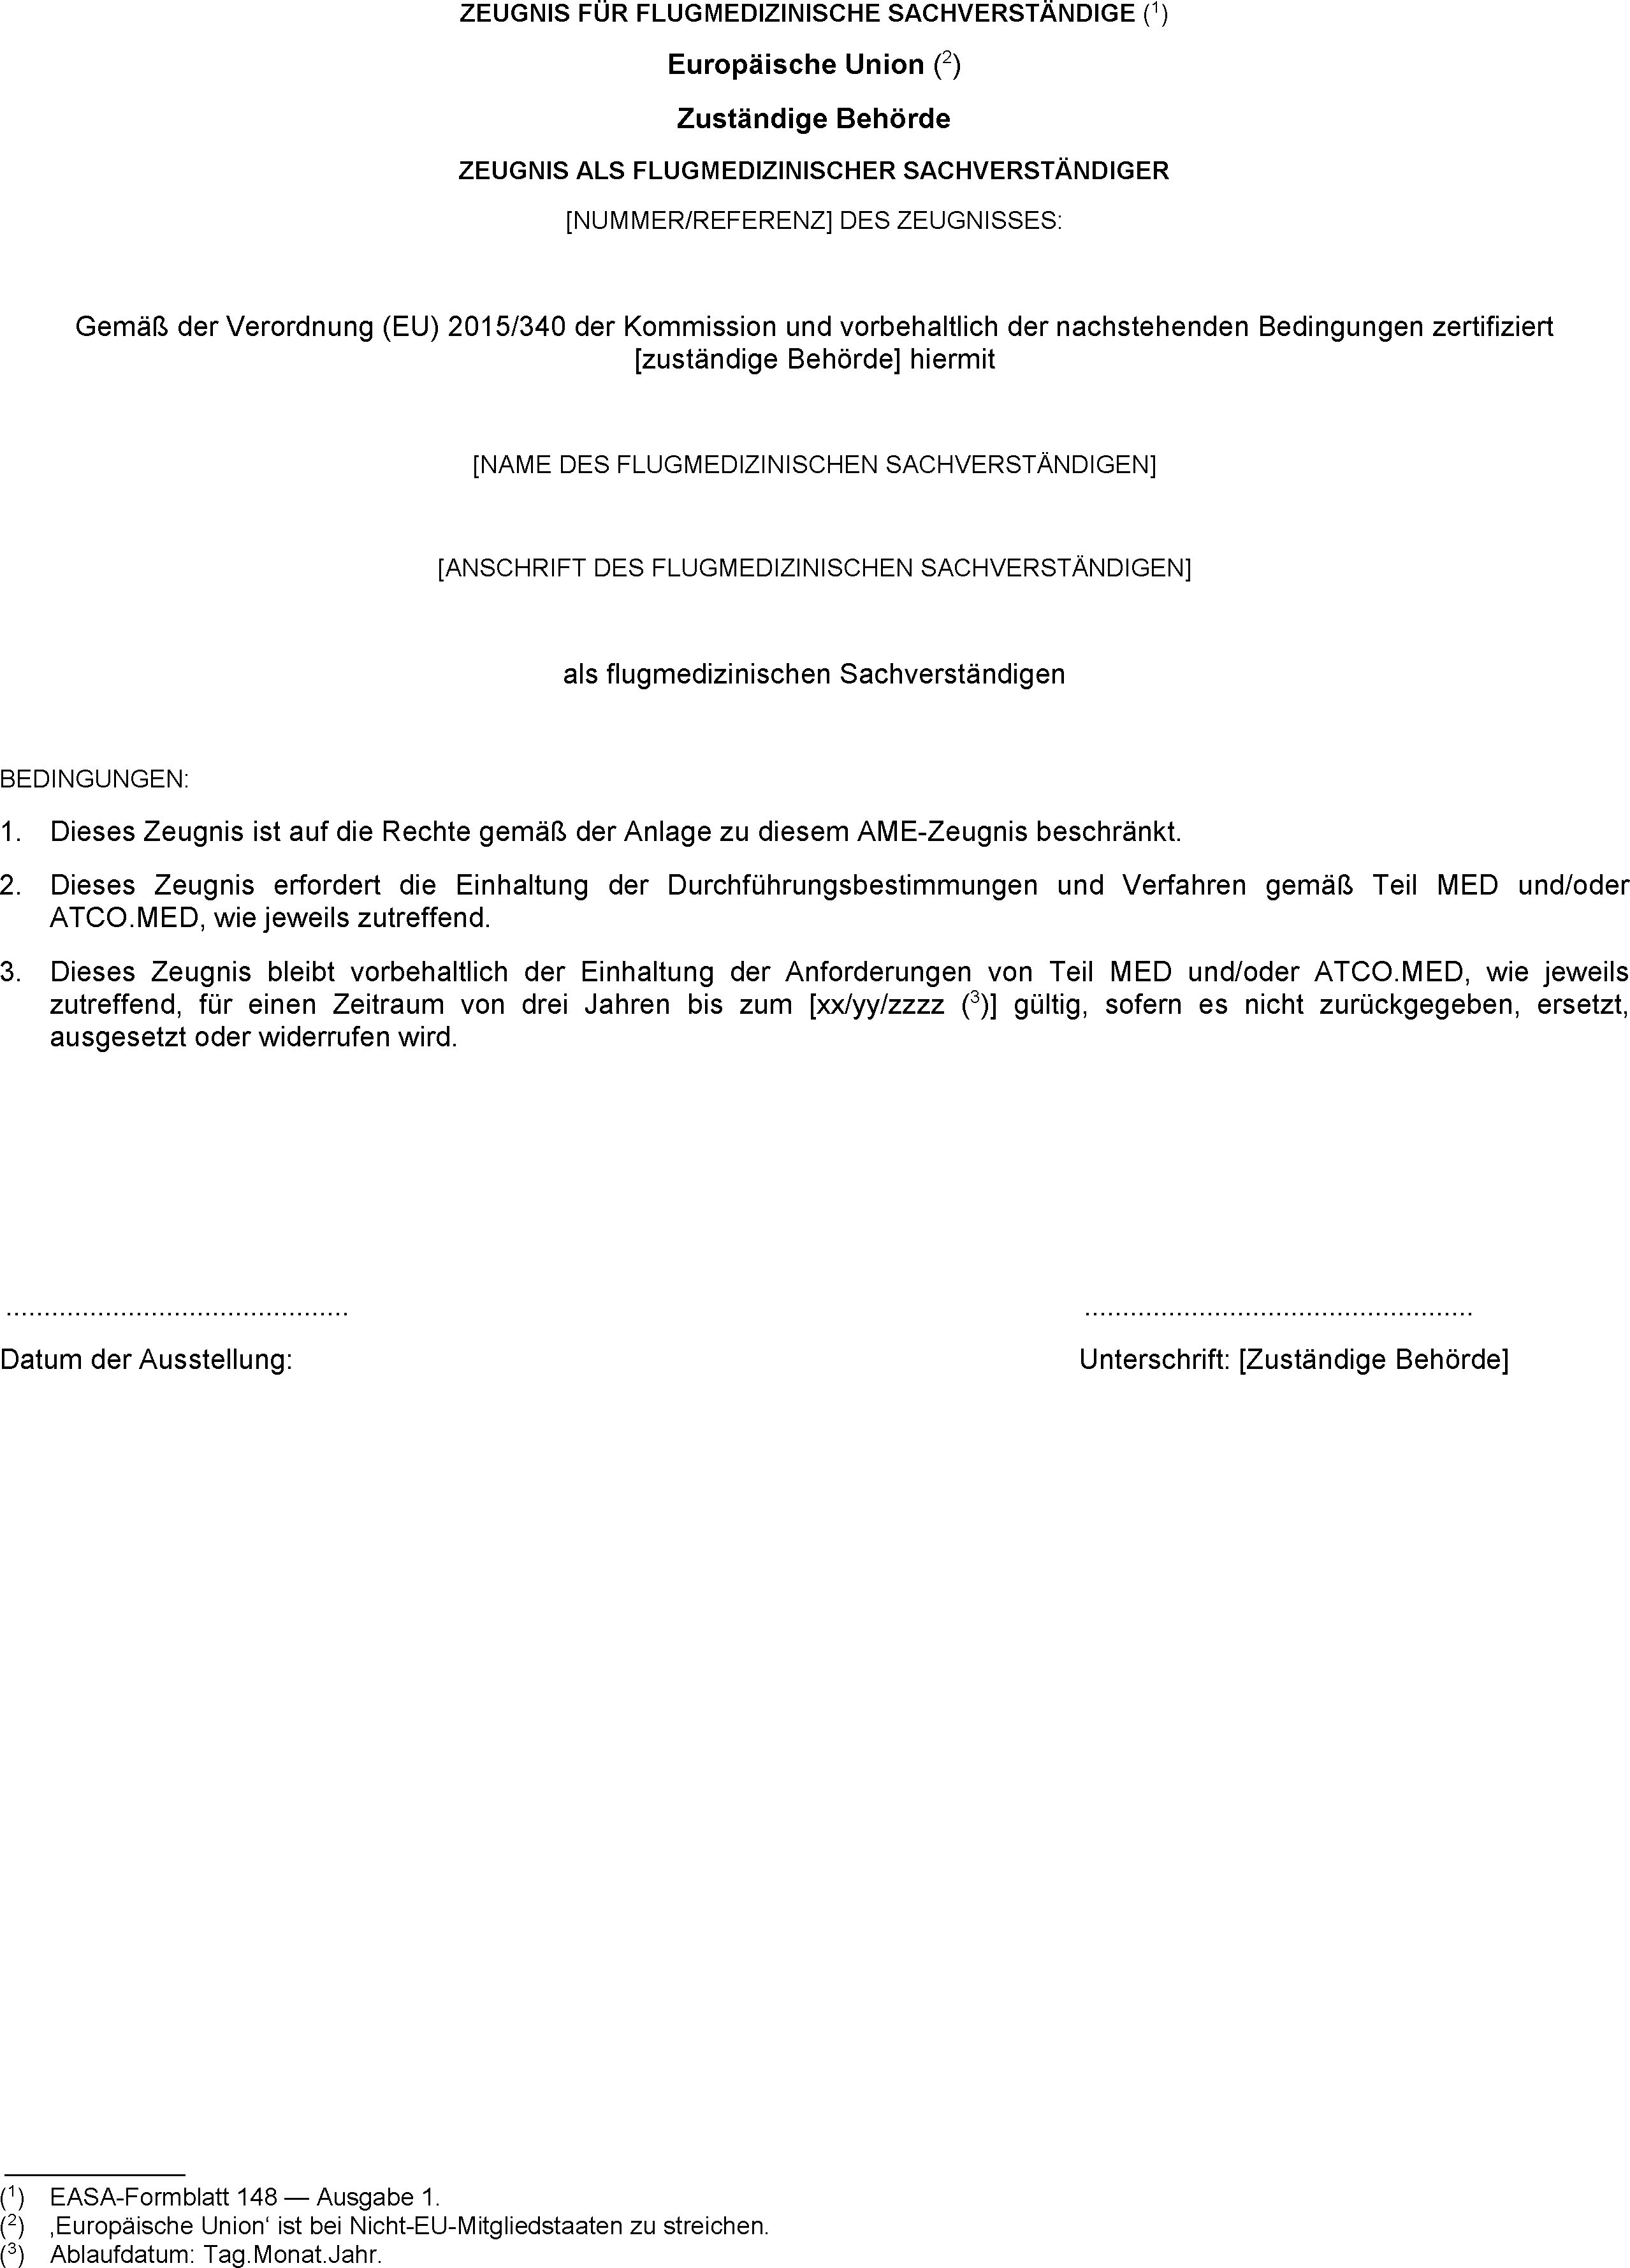 EUR-Lex - 02015R0340-20150306 - EN - EUR-Lex